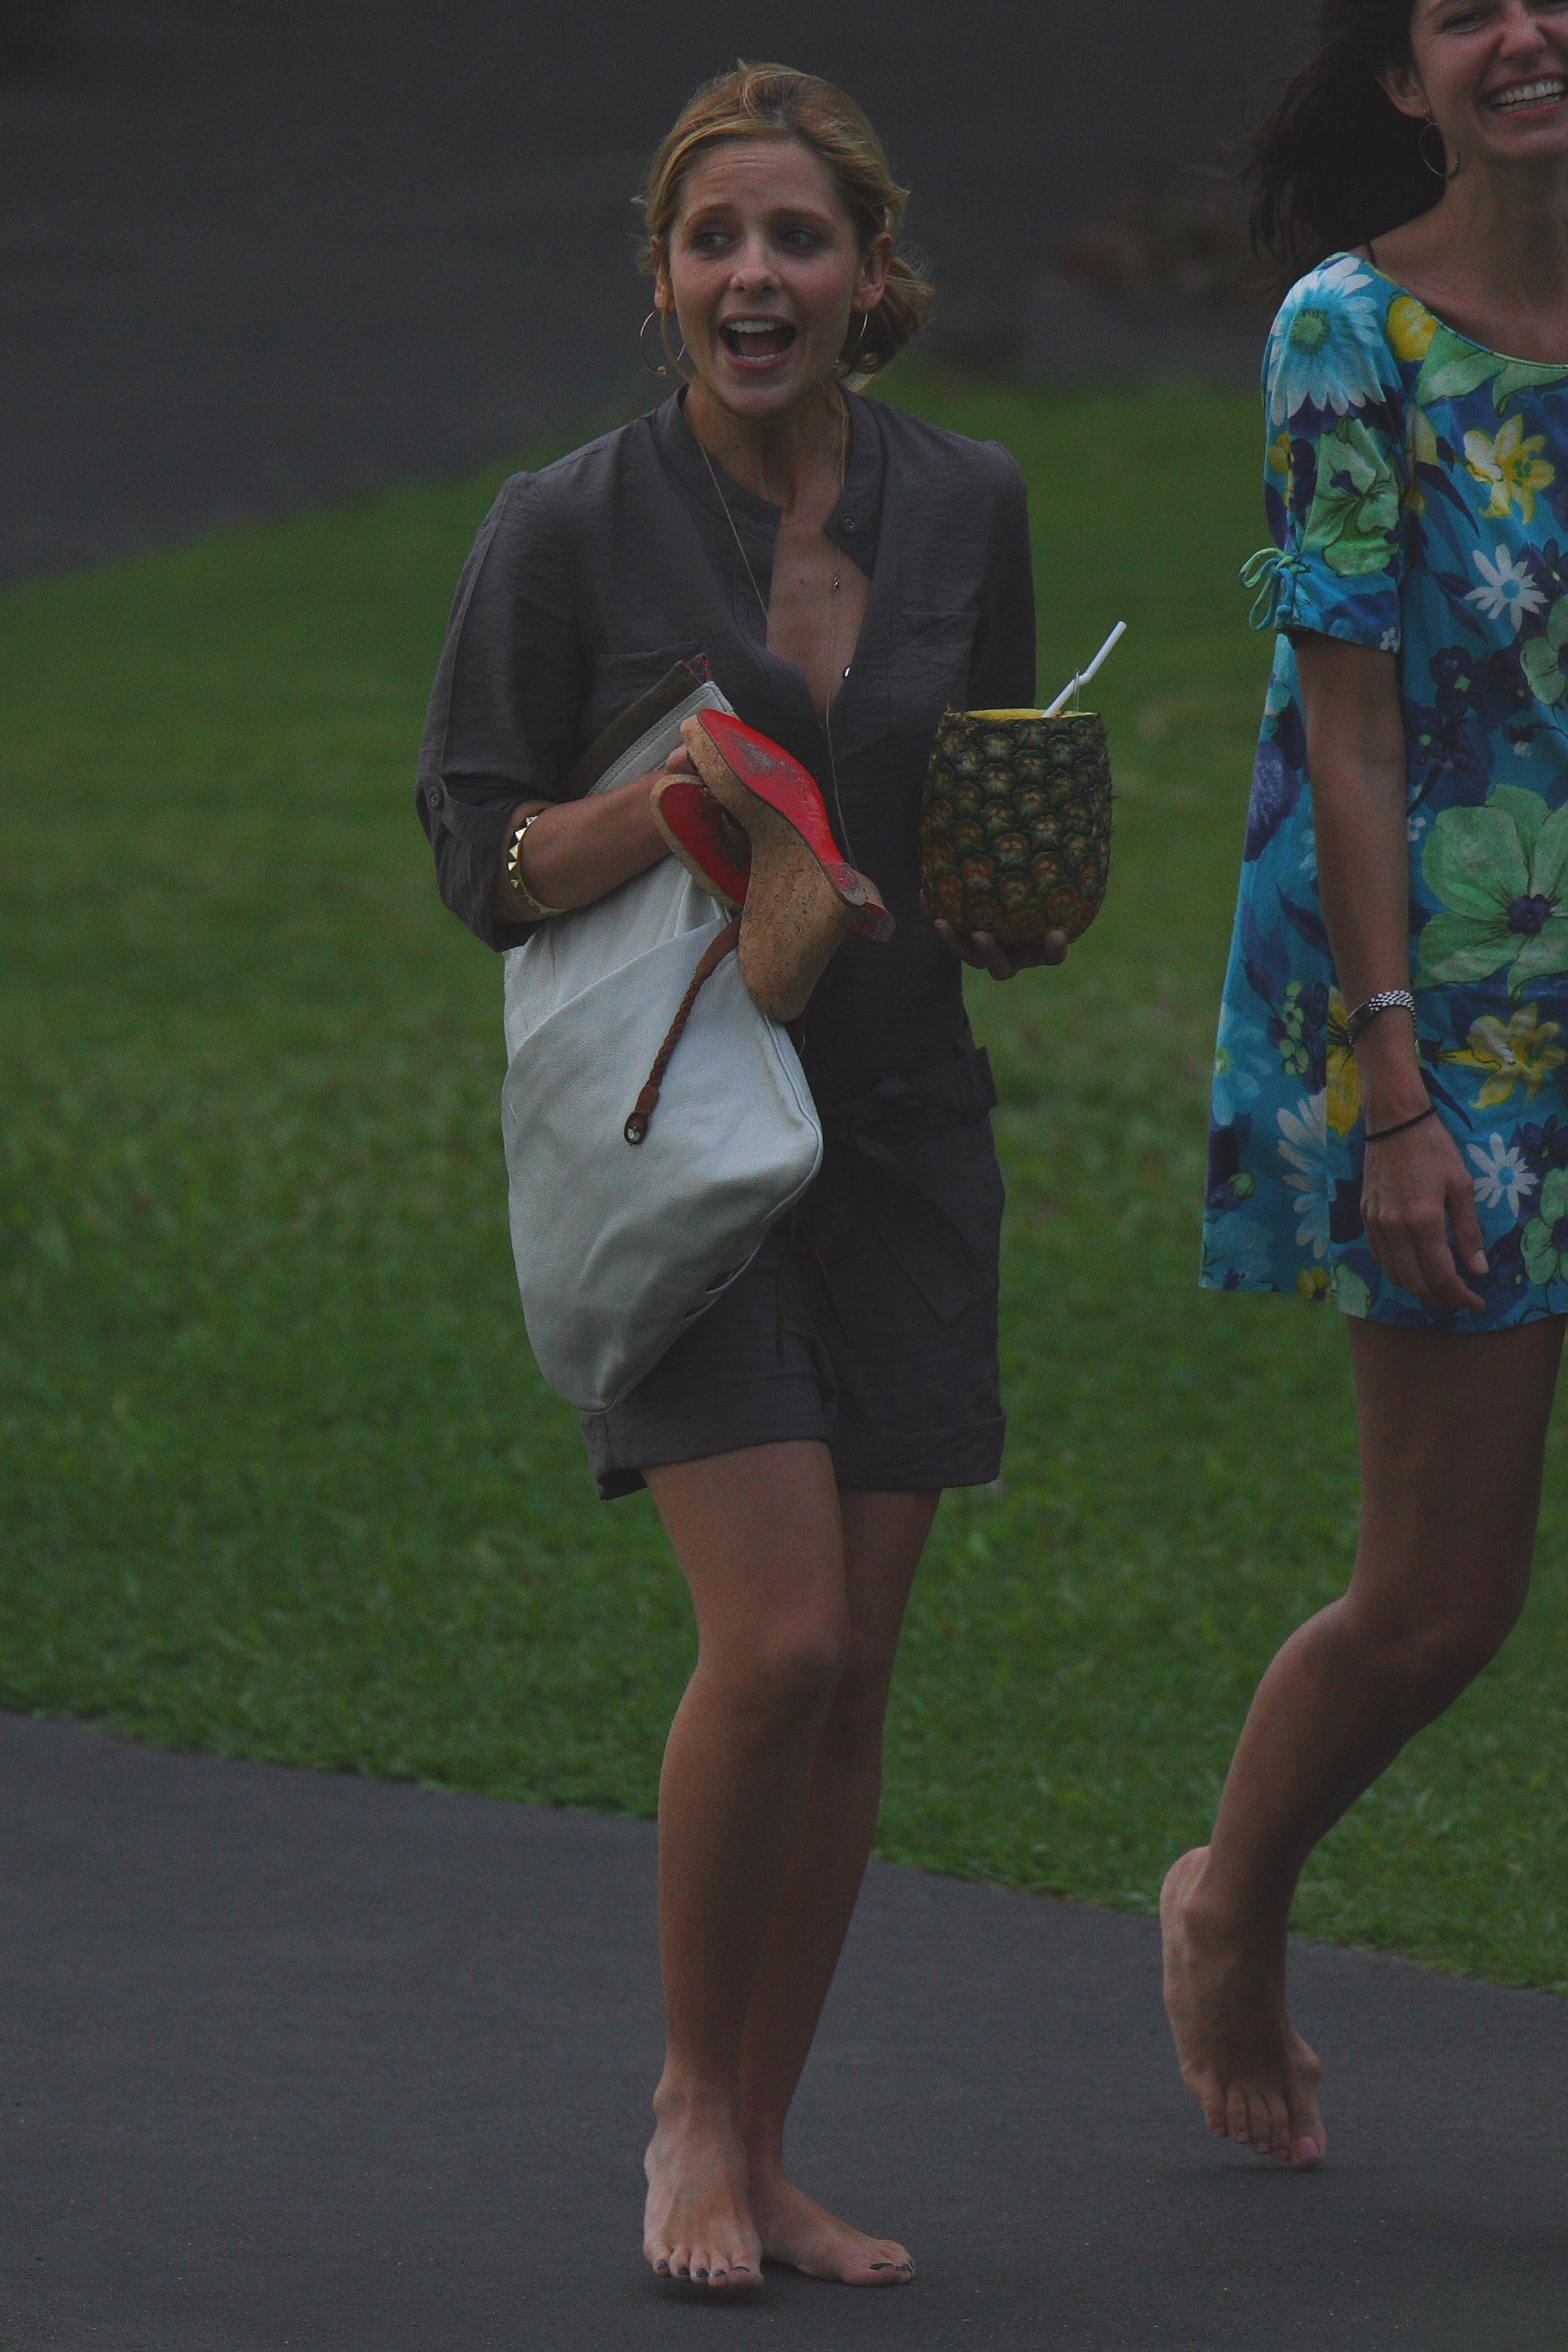 https://pics.wikifeet.com/Sarah-Michelle-Gellar-Feet-32839.jpg